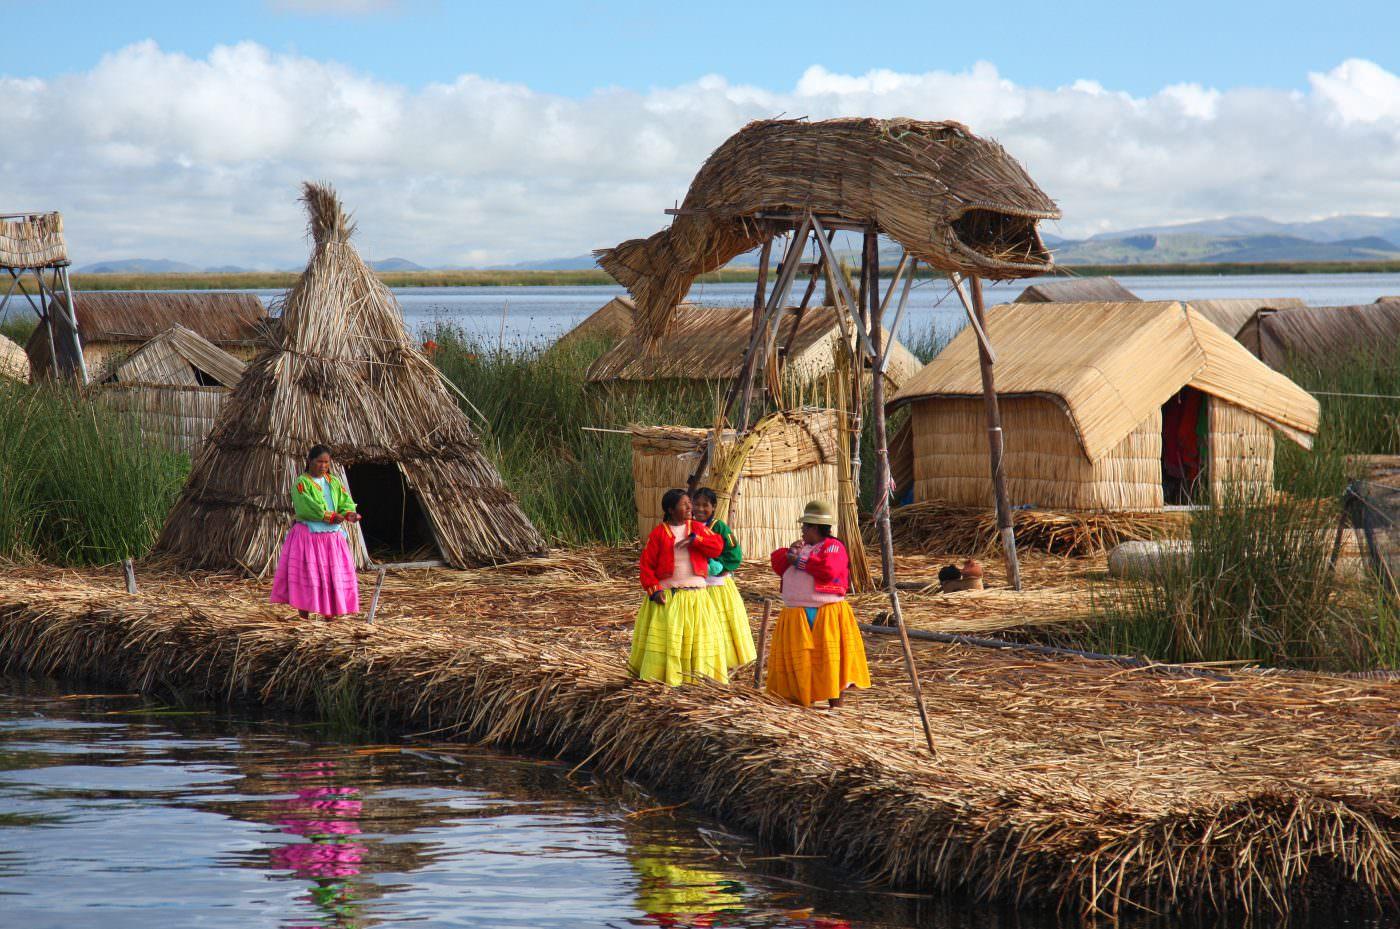 The Uros people on Lake Titicaca, Peru